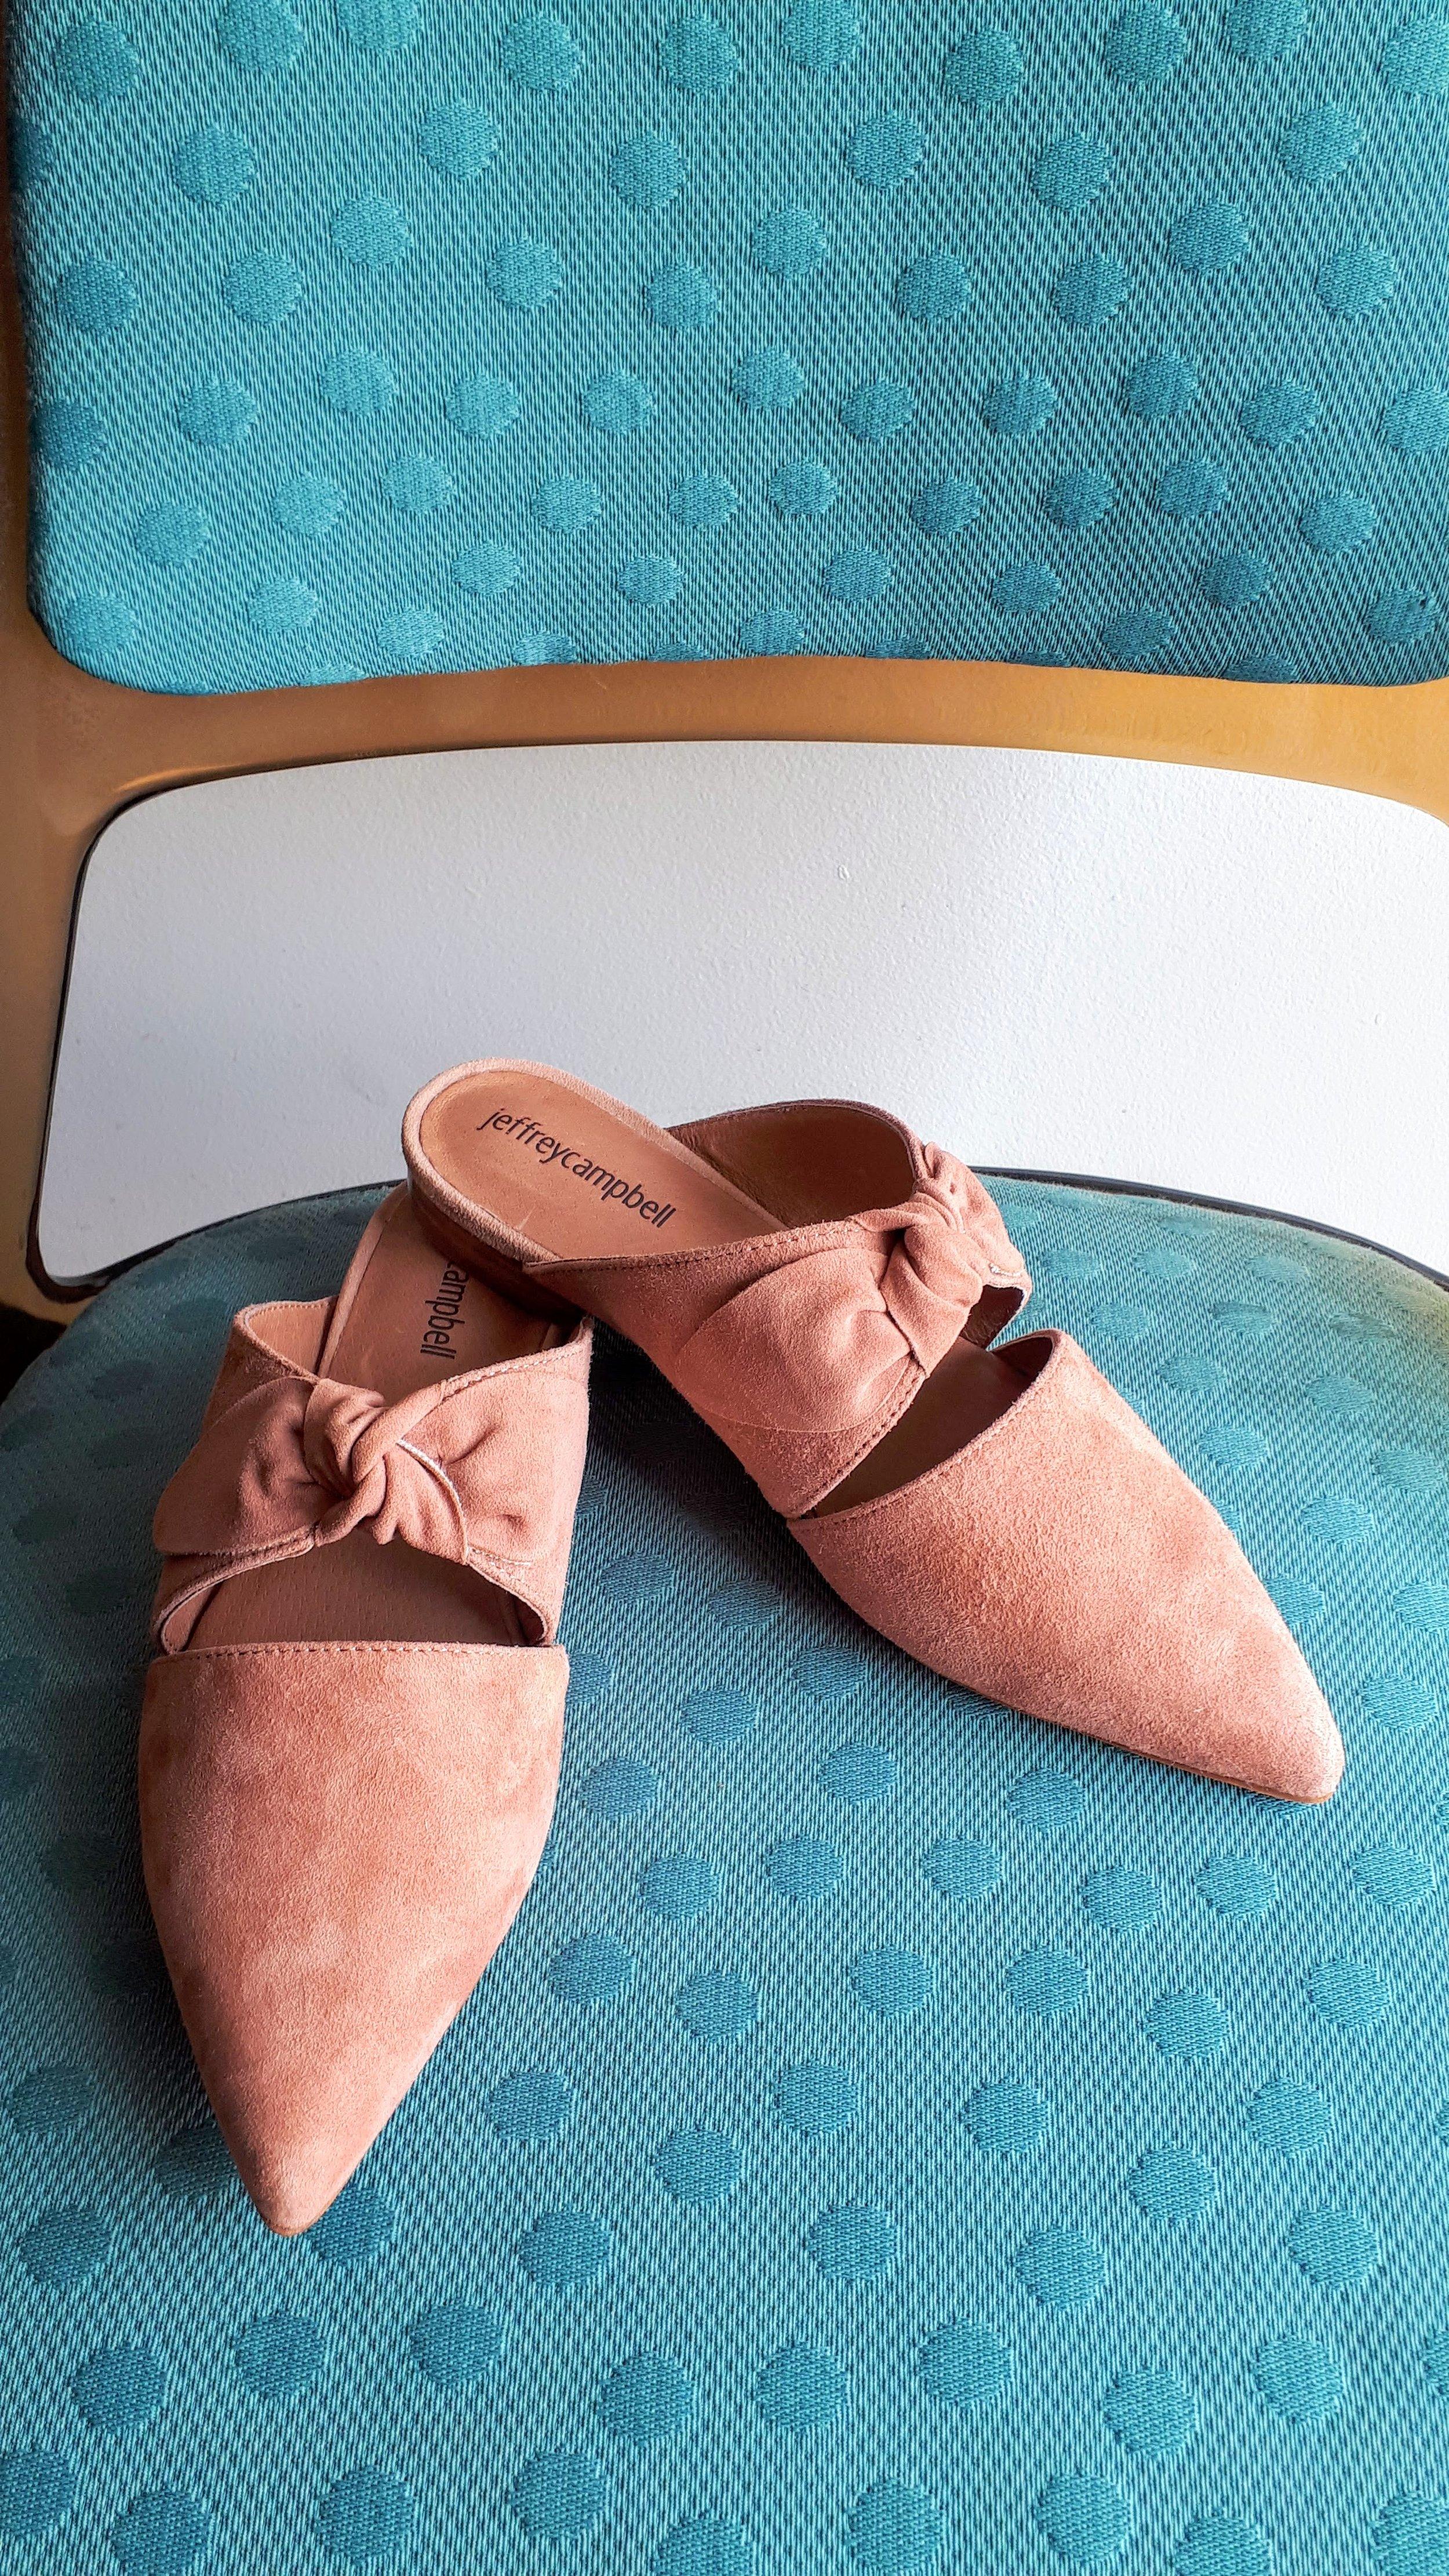 Jeffrey Campbell shoes; S6.5, $68